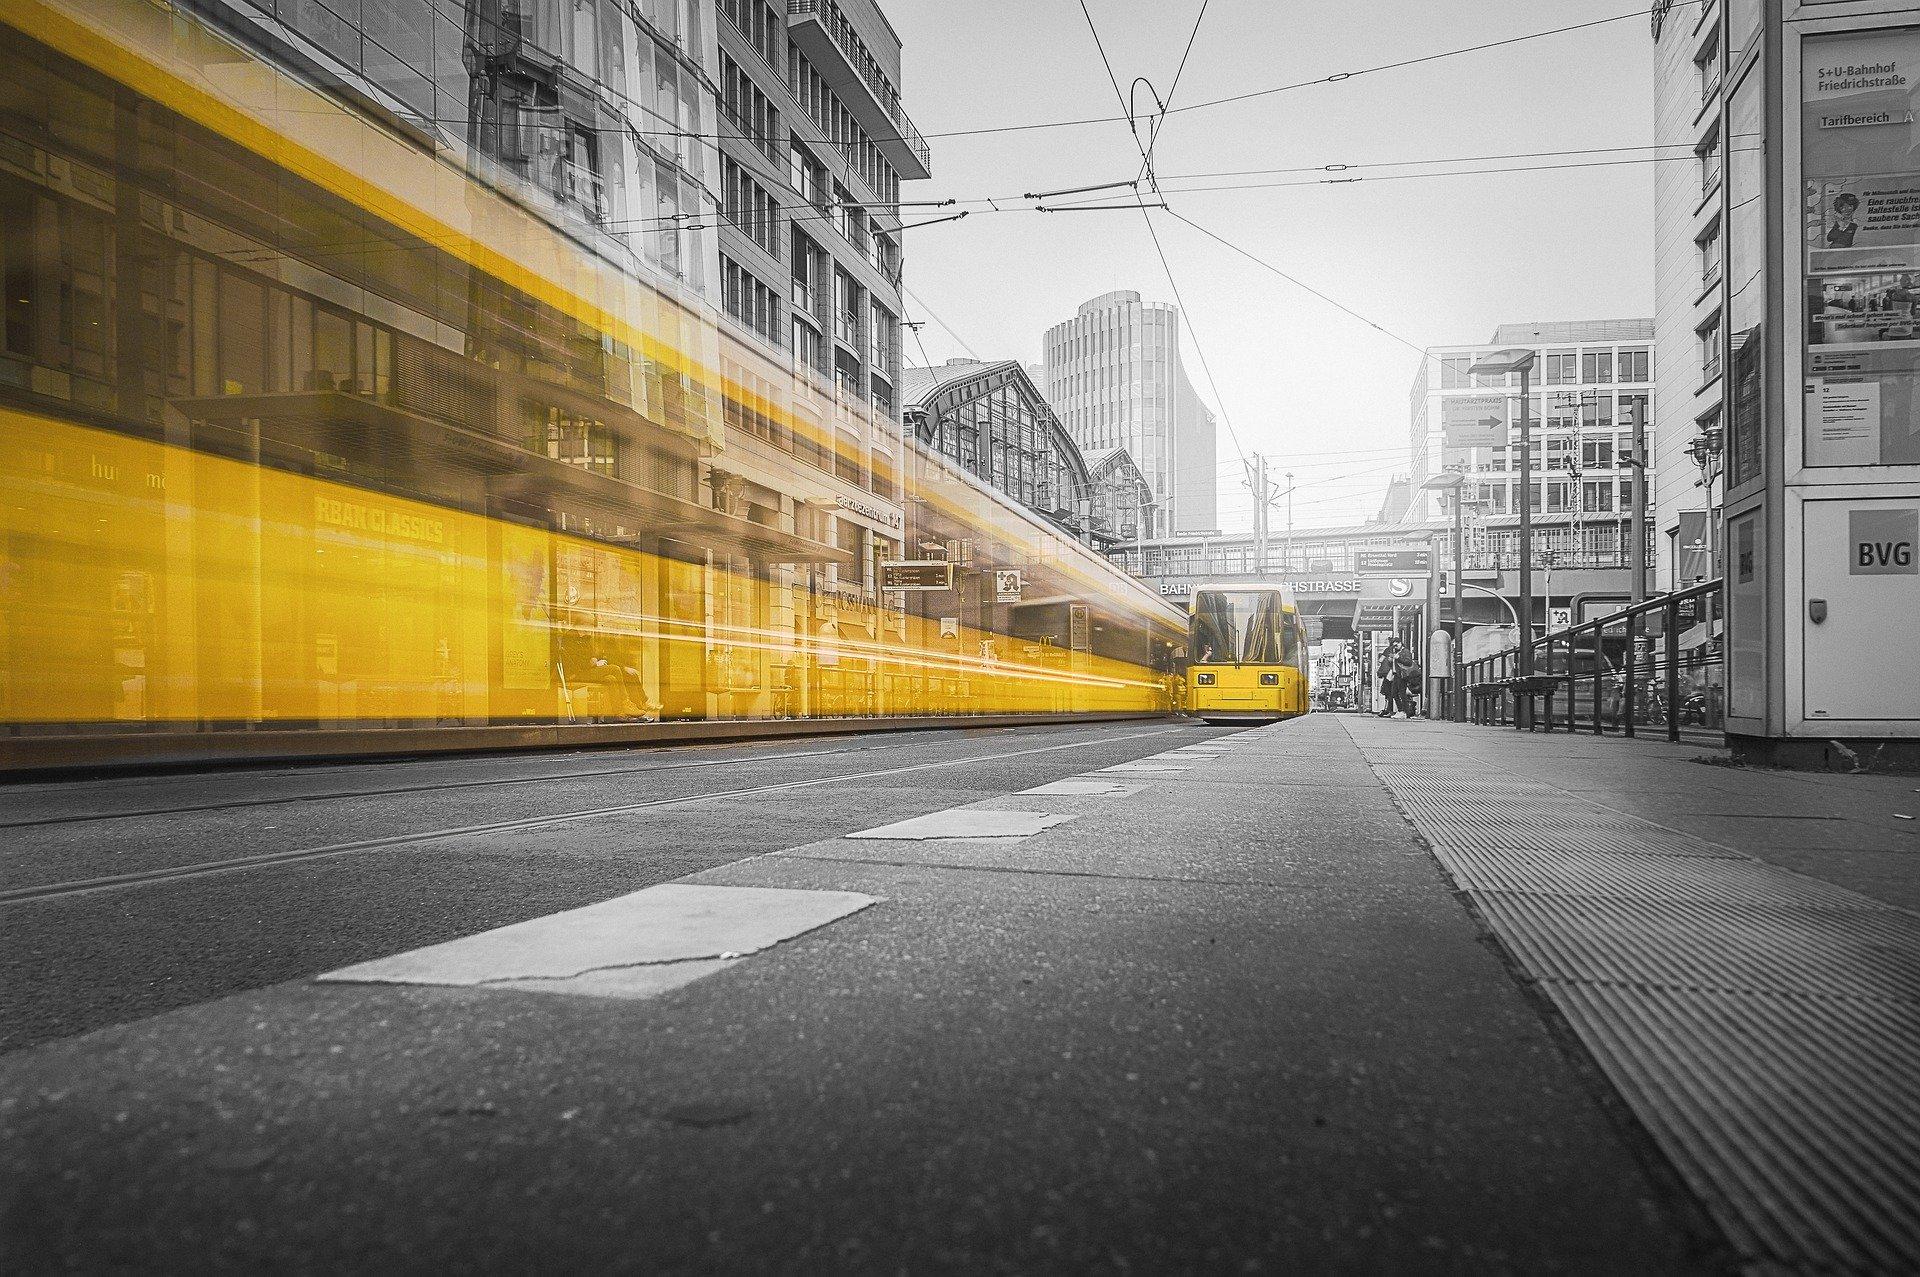 Tram an der Friedrichstraße